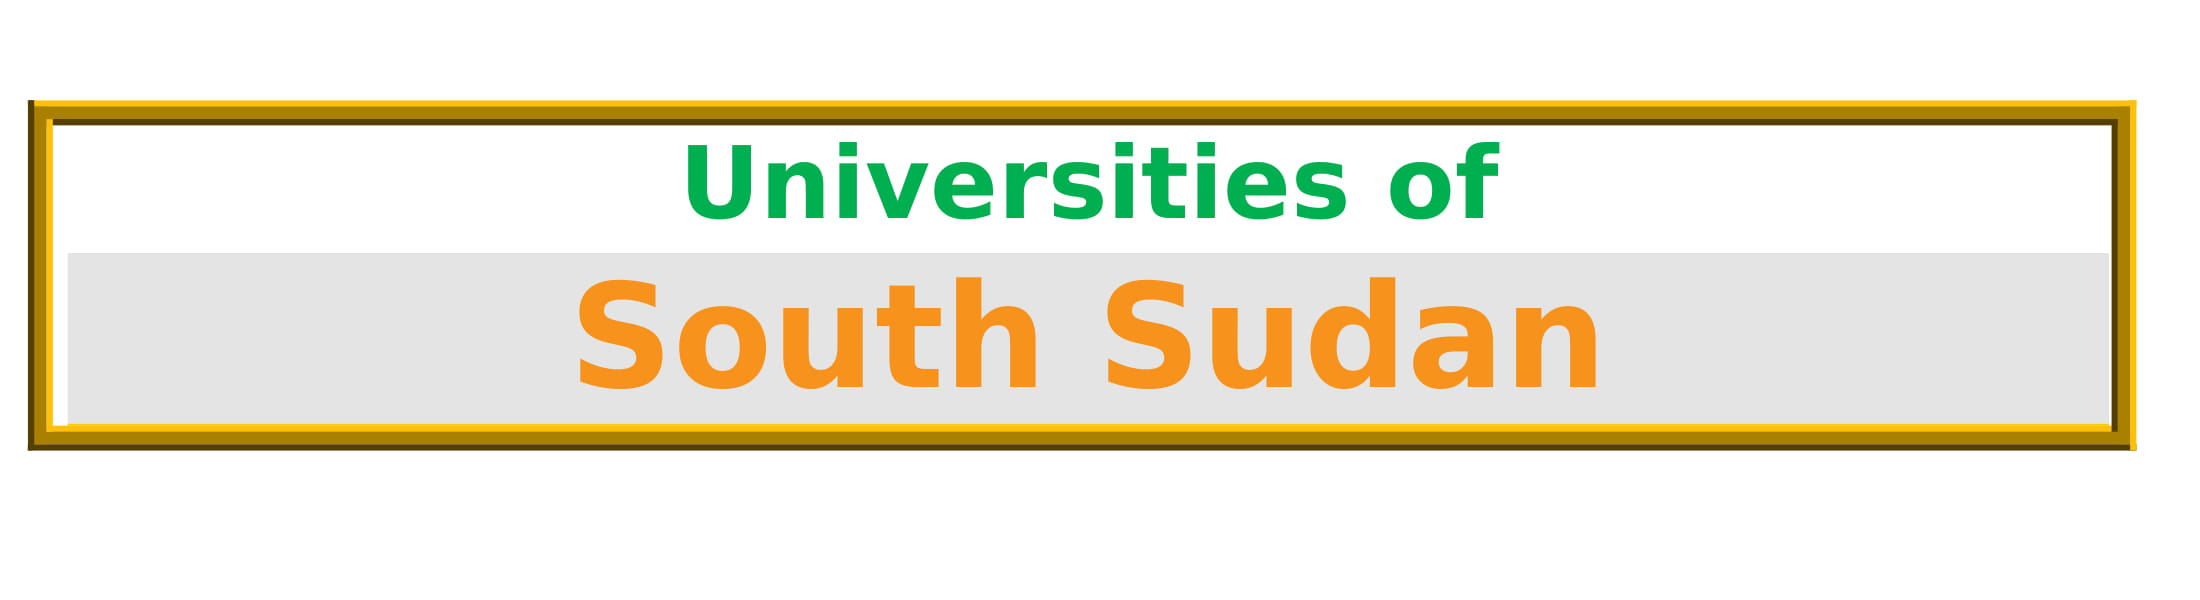 List of Universities in South Sudan